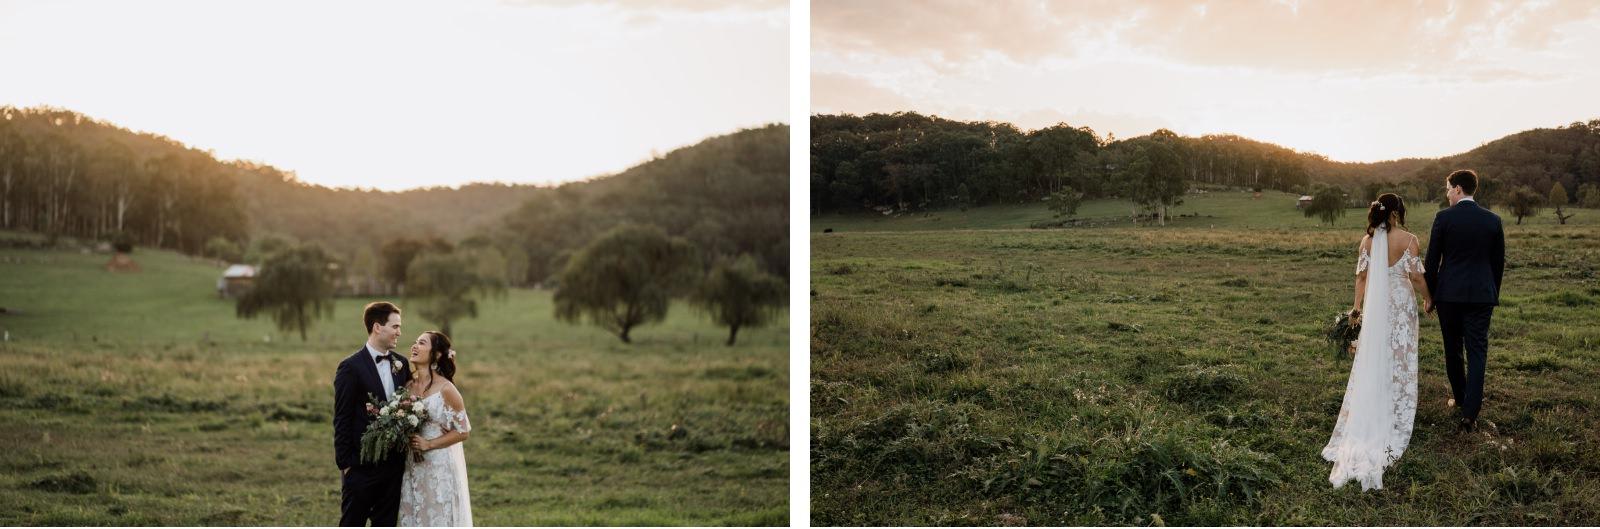 wollombi-wedding-photography-hunter-valley-wedding-photographers-79